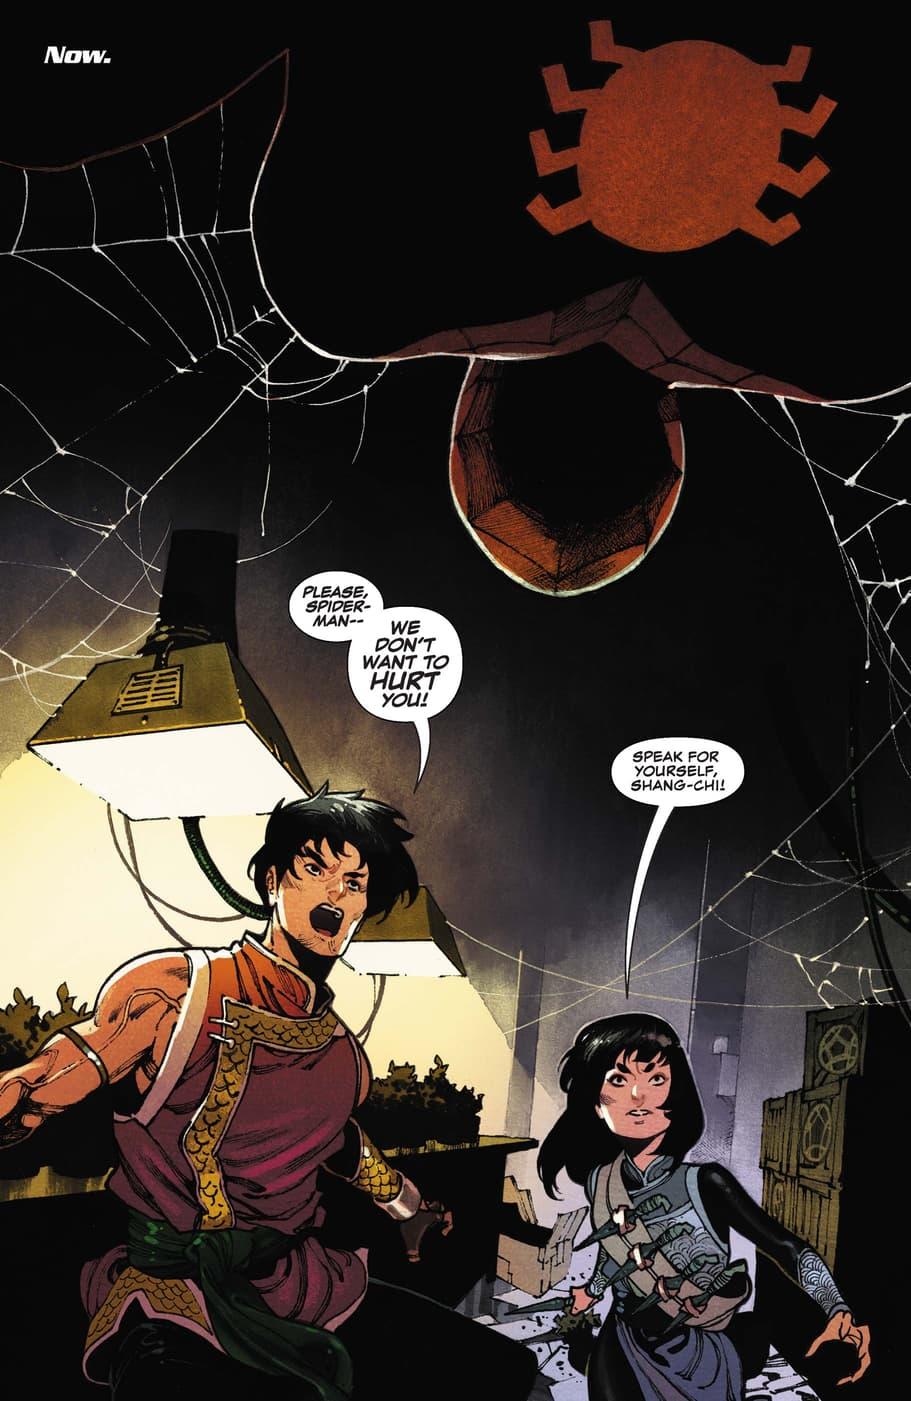 Shang-Chi versus Spider-Man!